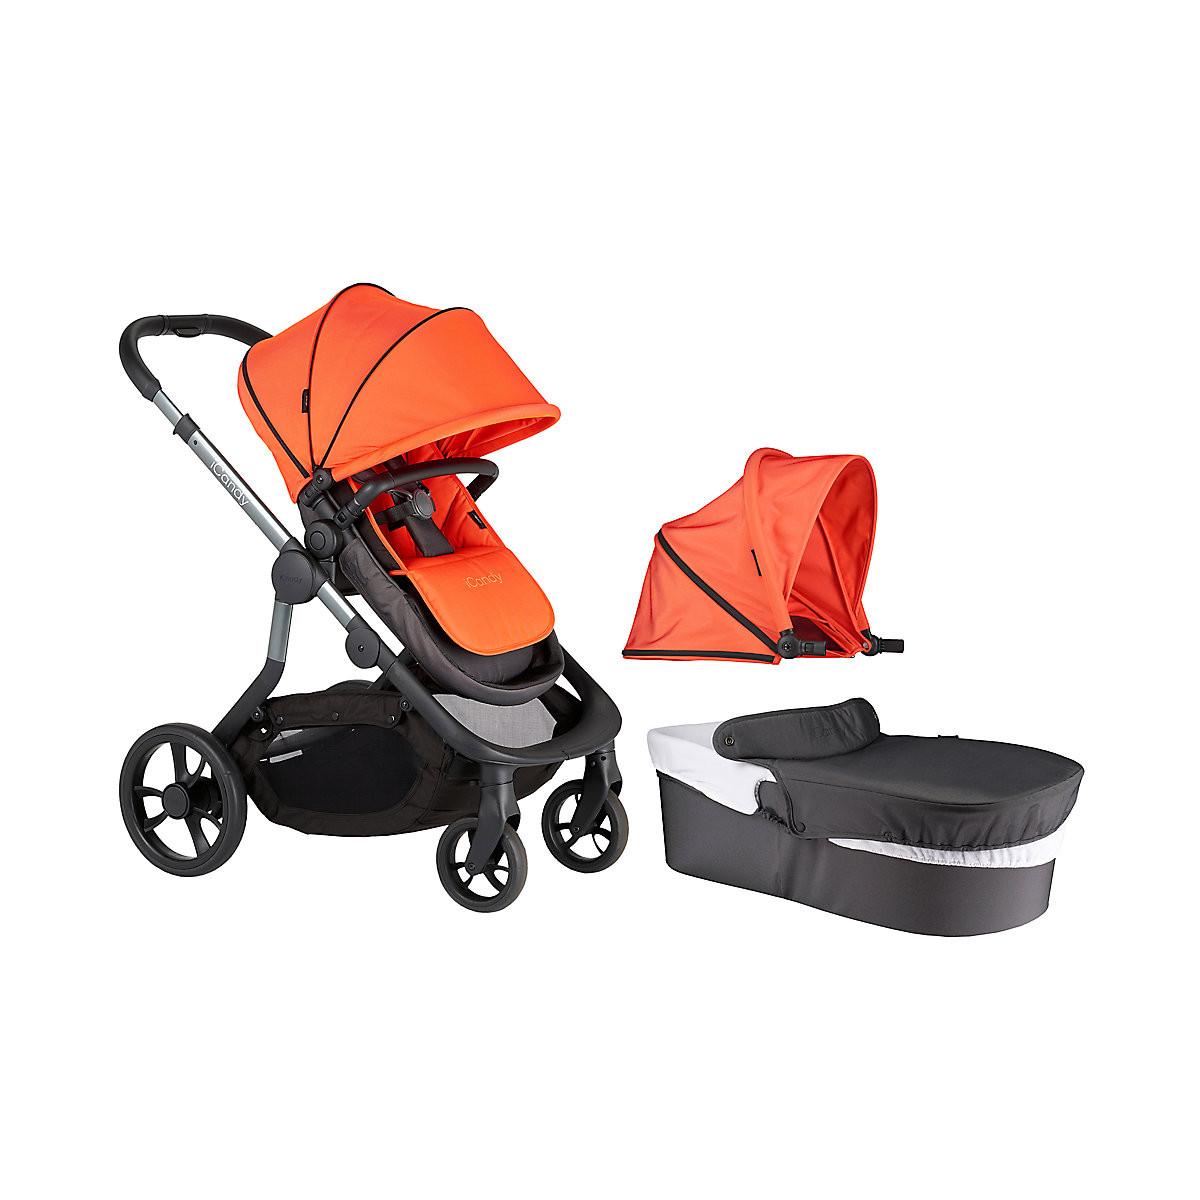 Icandy Orange Travel System Reviews